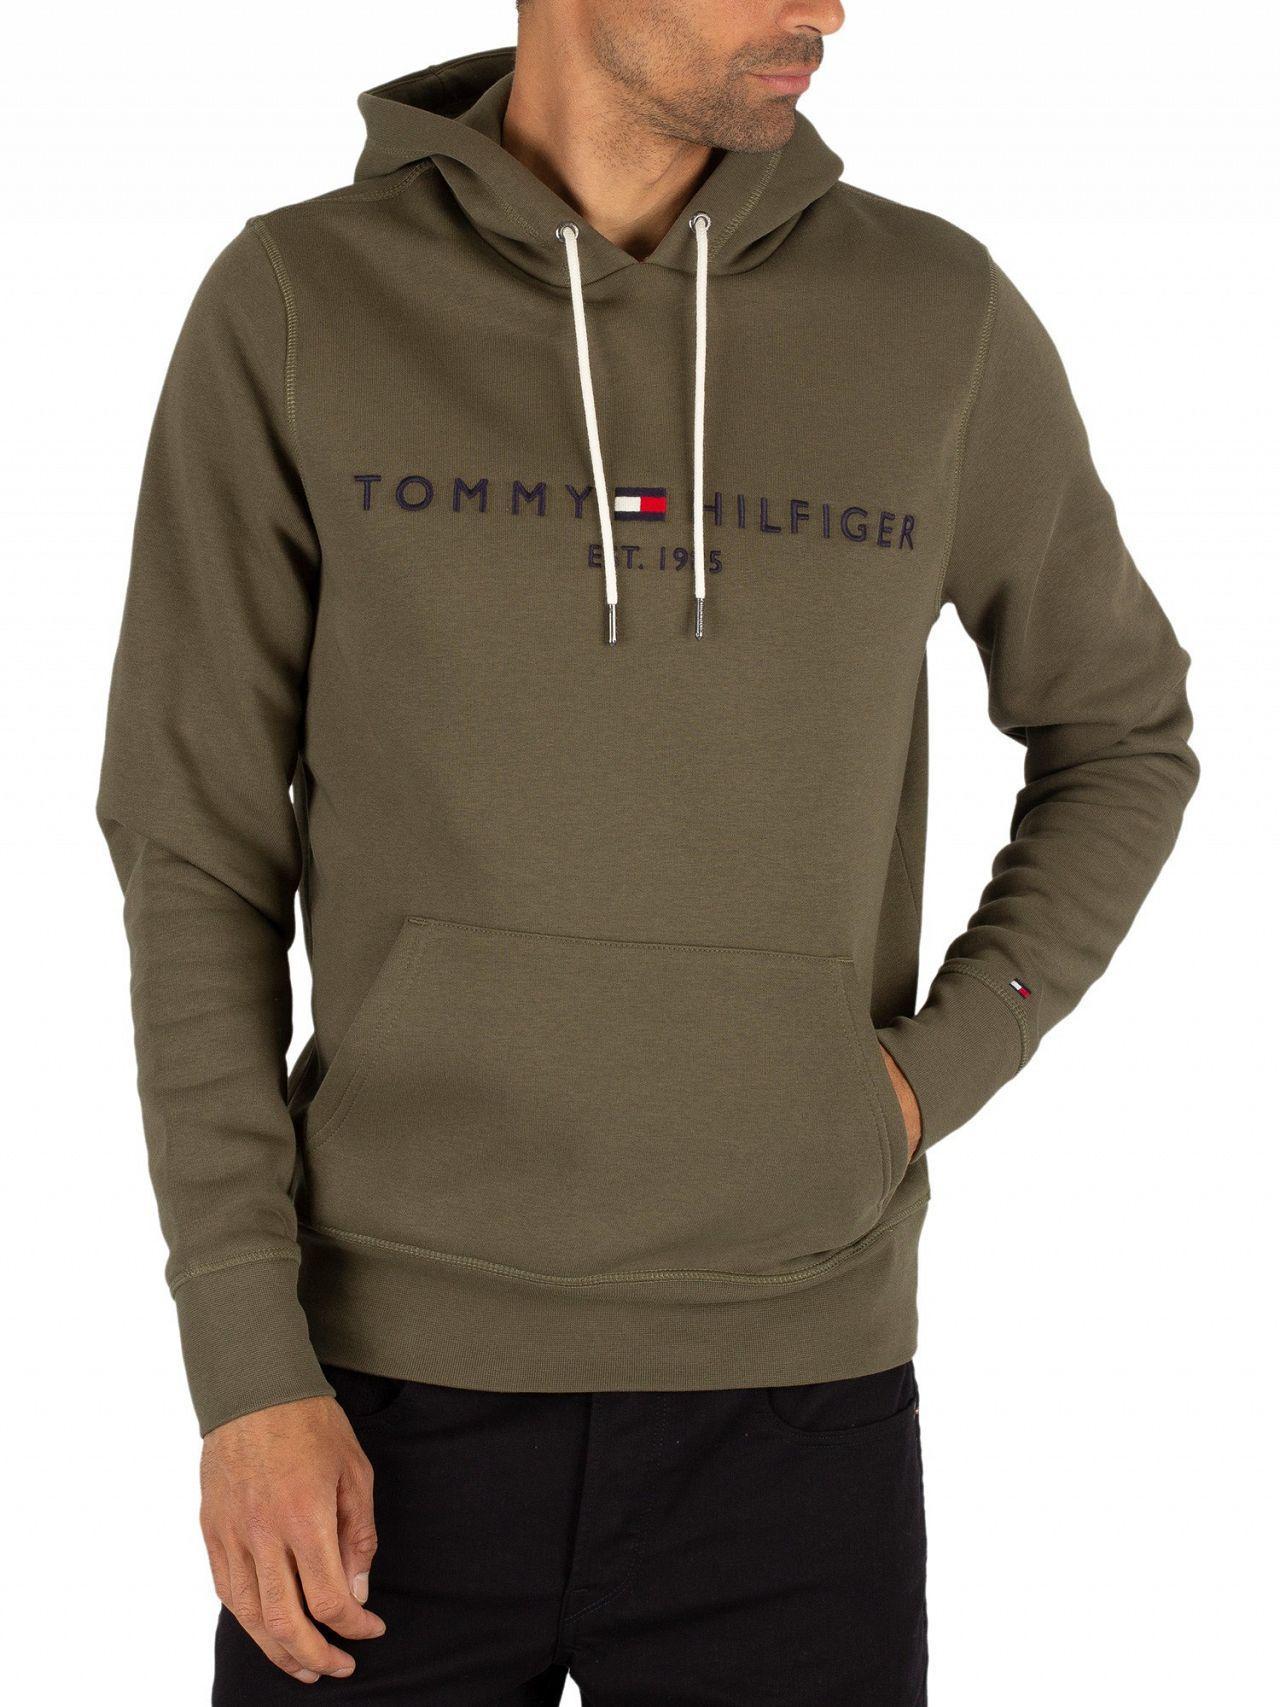 Tommy Hilfiger Logo Crew Neck Sweater, Grape Leaf